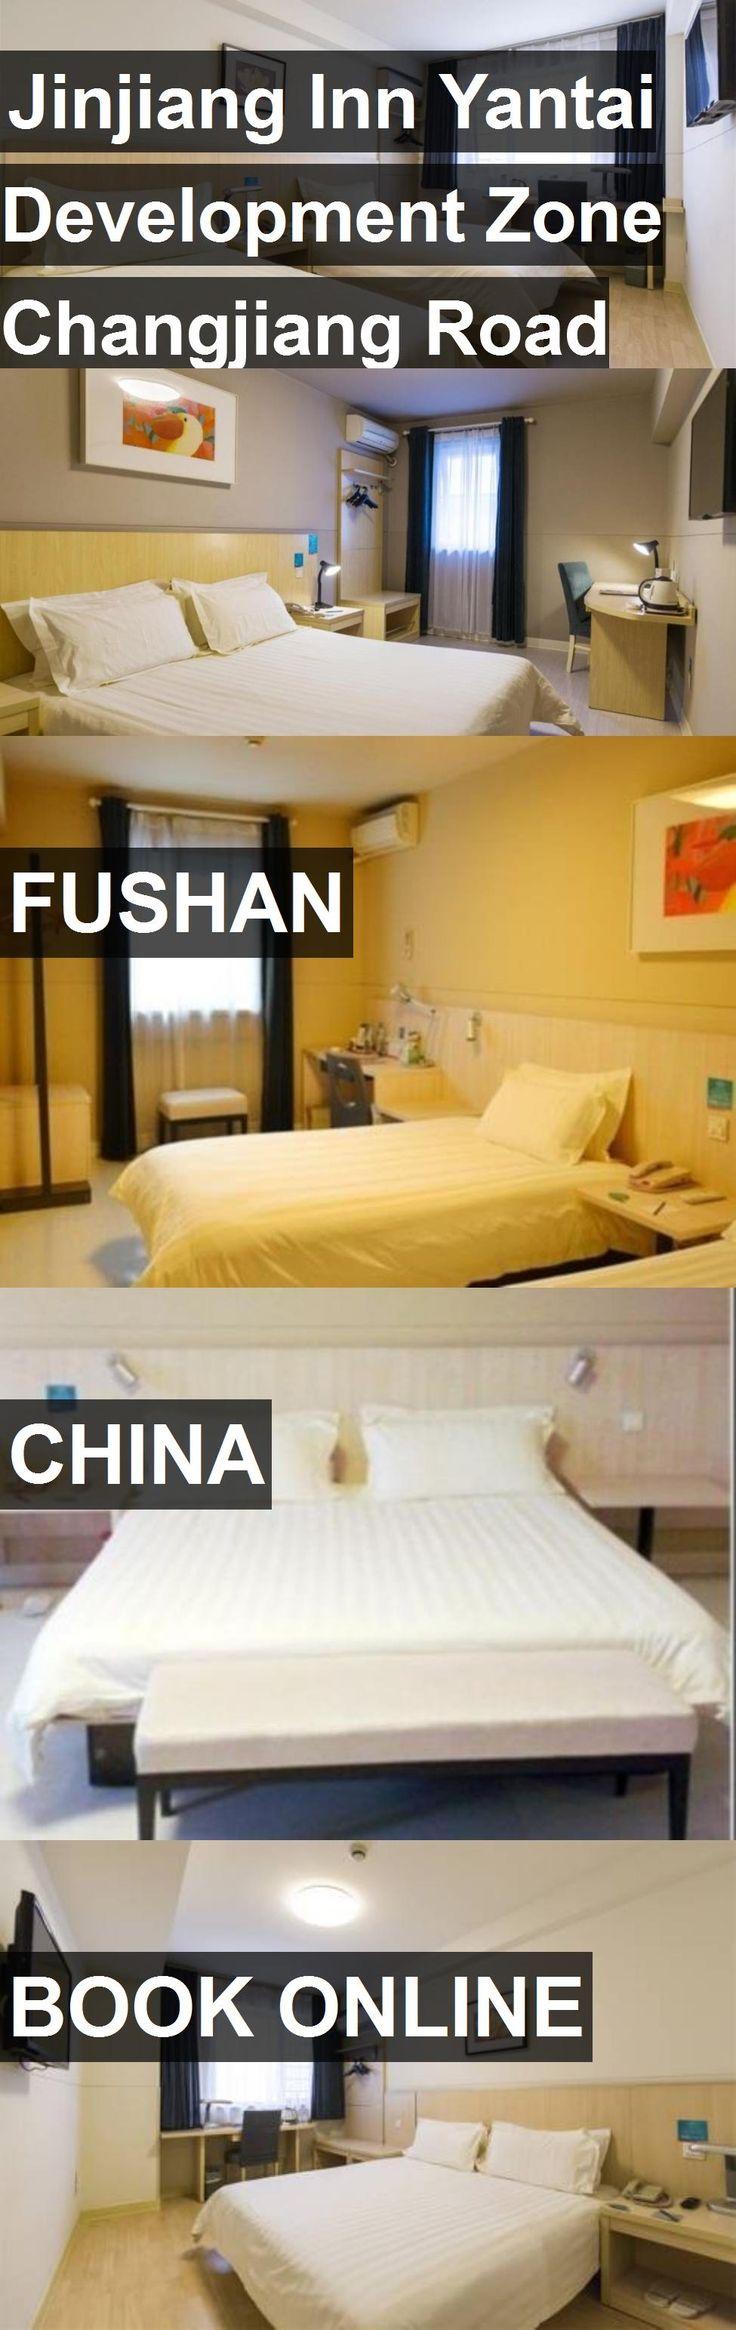 Hotel Jinjiang Inn Yantai Development Zone Changjiang Road Tianshan Road in Fushan, China. For more information, photos, reviews and best prices please follow the link. #China #Fushan #travel #vacation #hotel